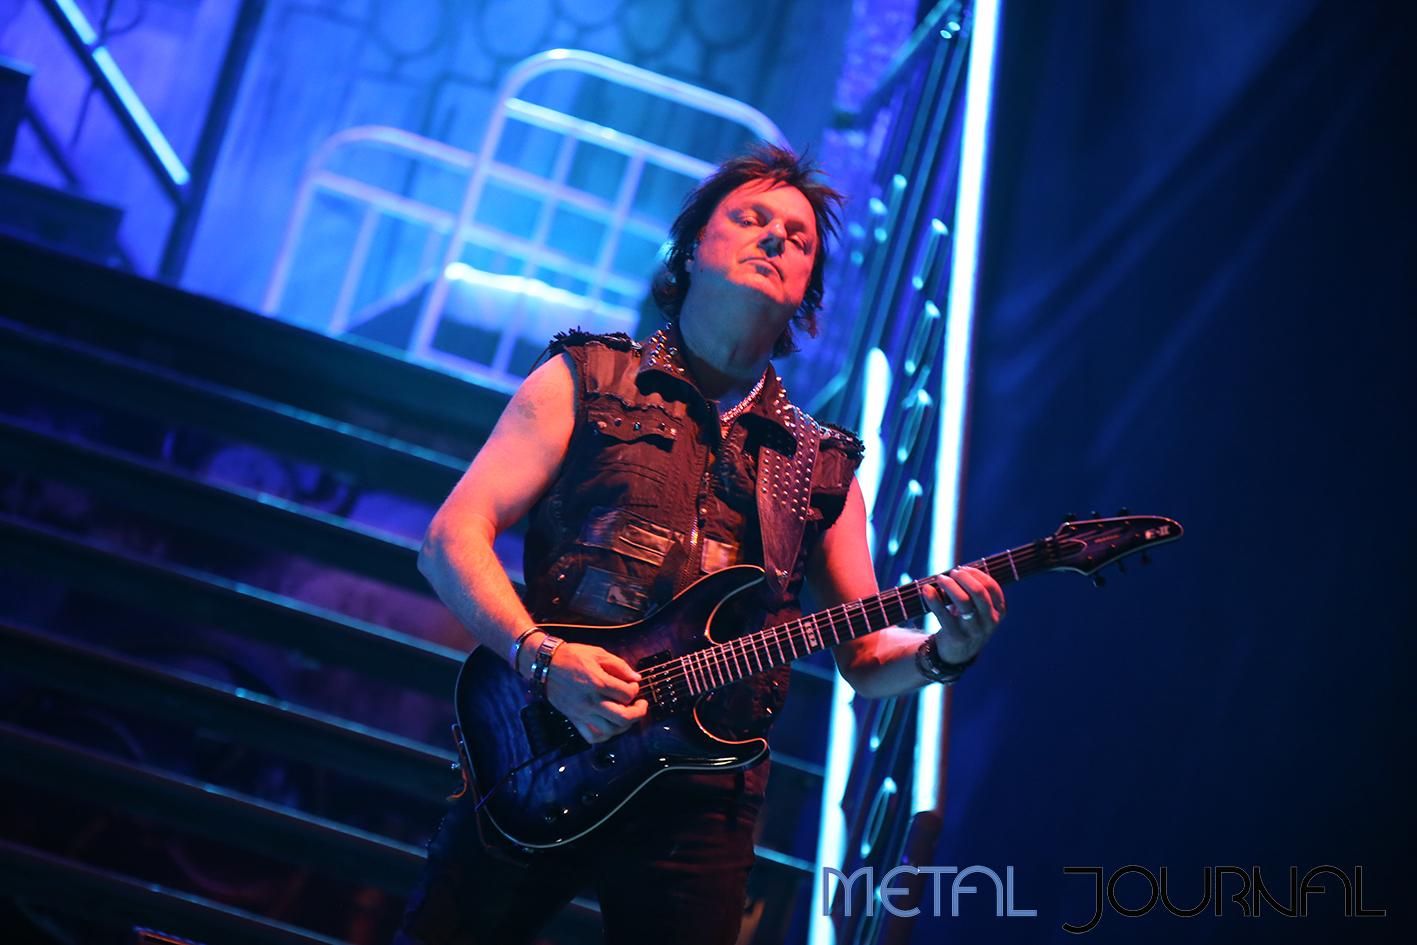 king diamond - metal journal rock fest barcelona 2019 pic 16